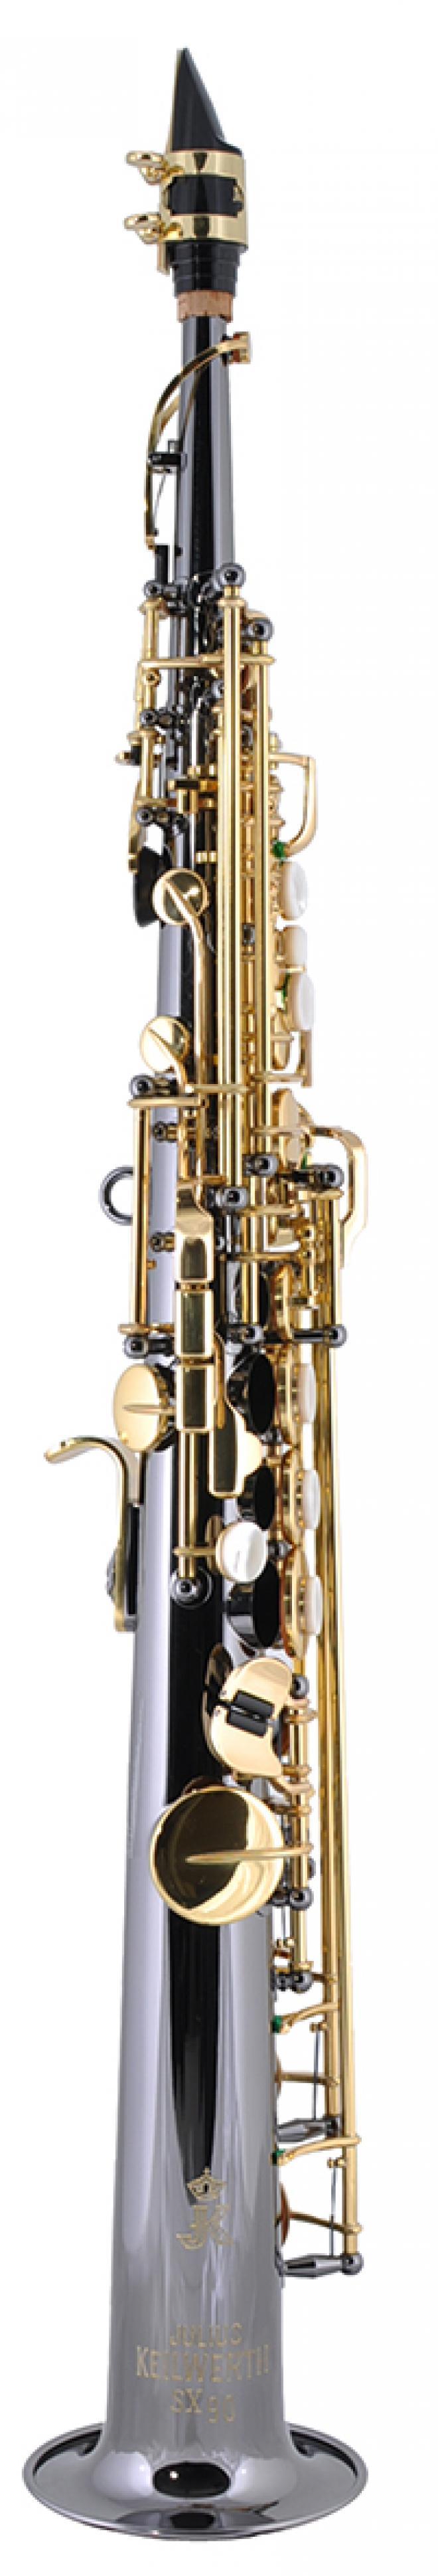 "Keilwerth Model JK1300-5B Soprano Sax - Black Nickel Finish ""SX90"""